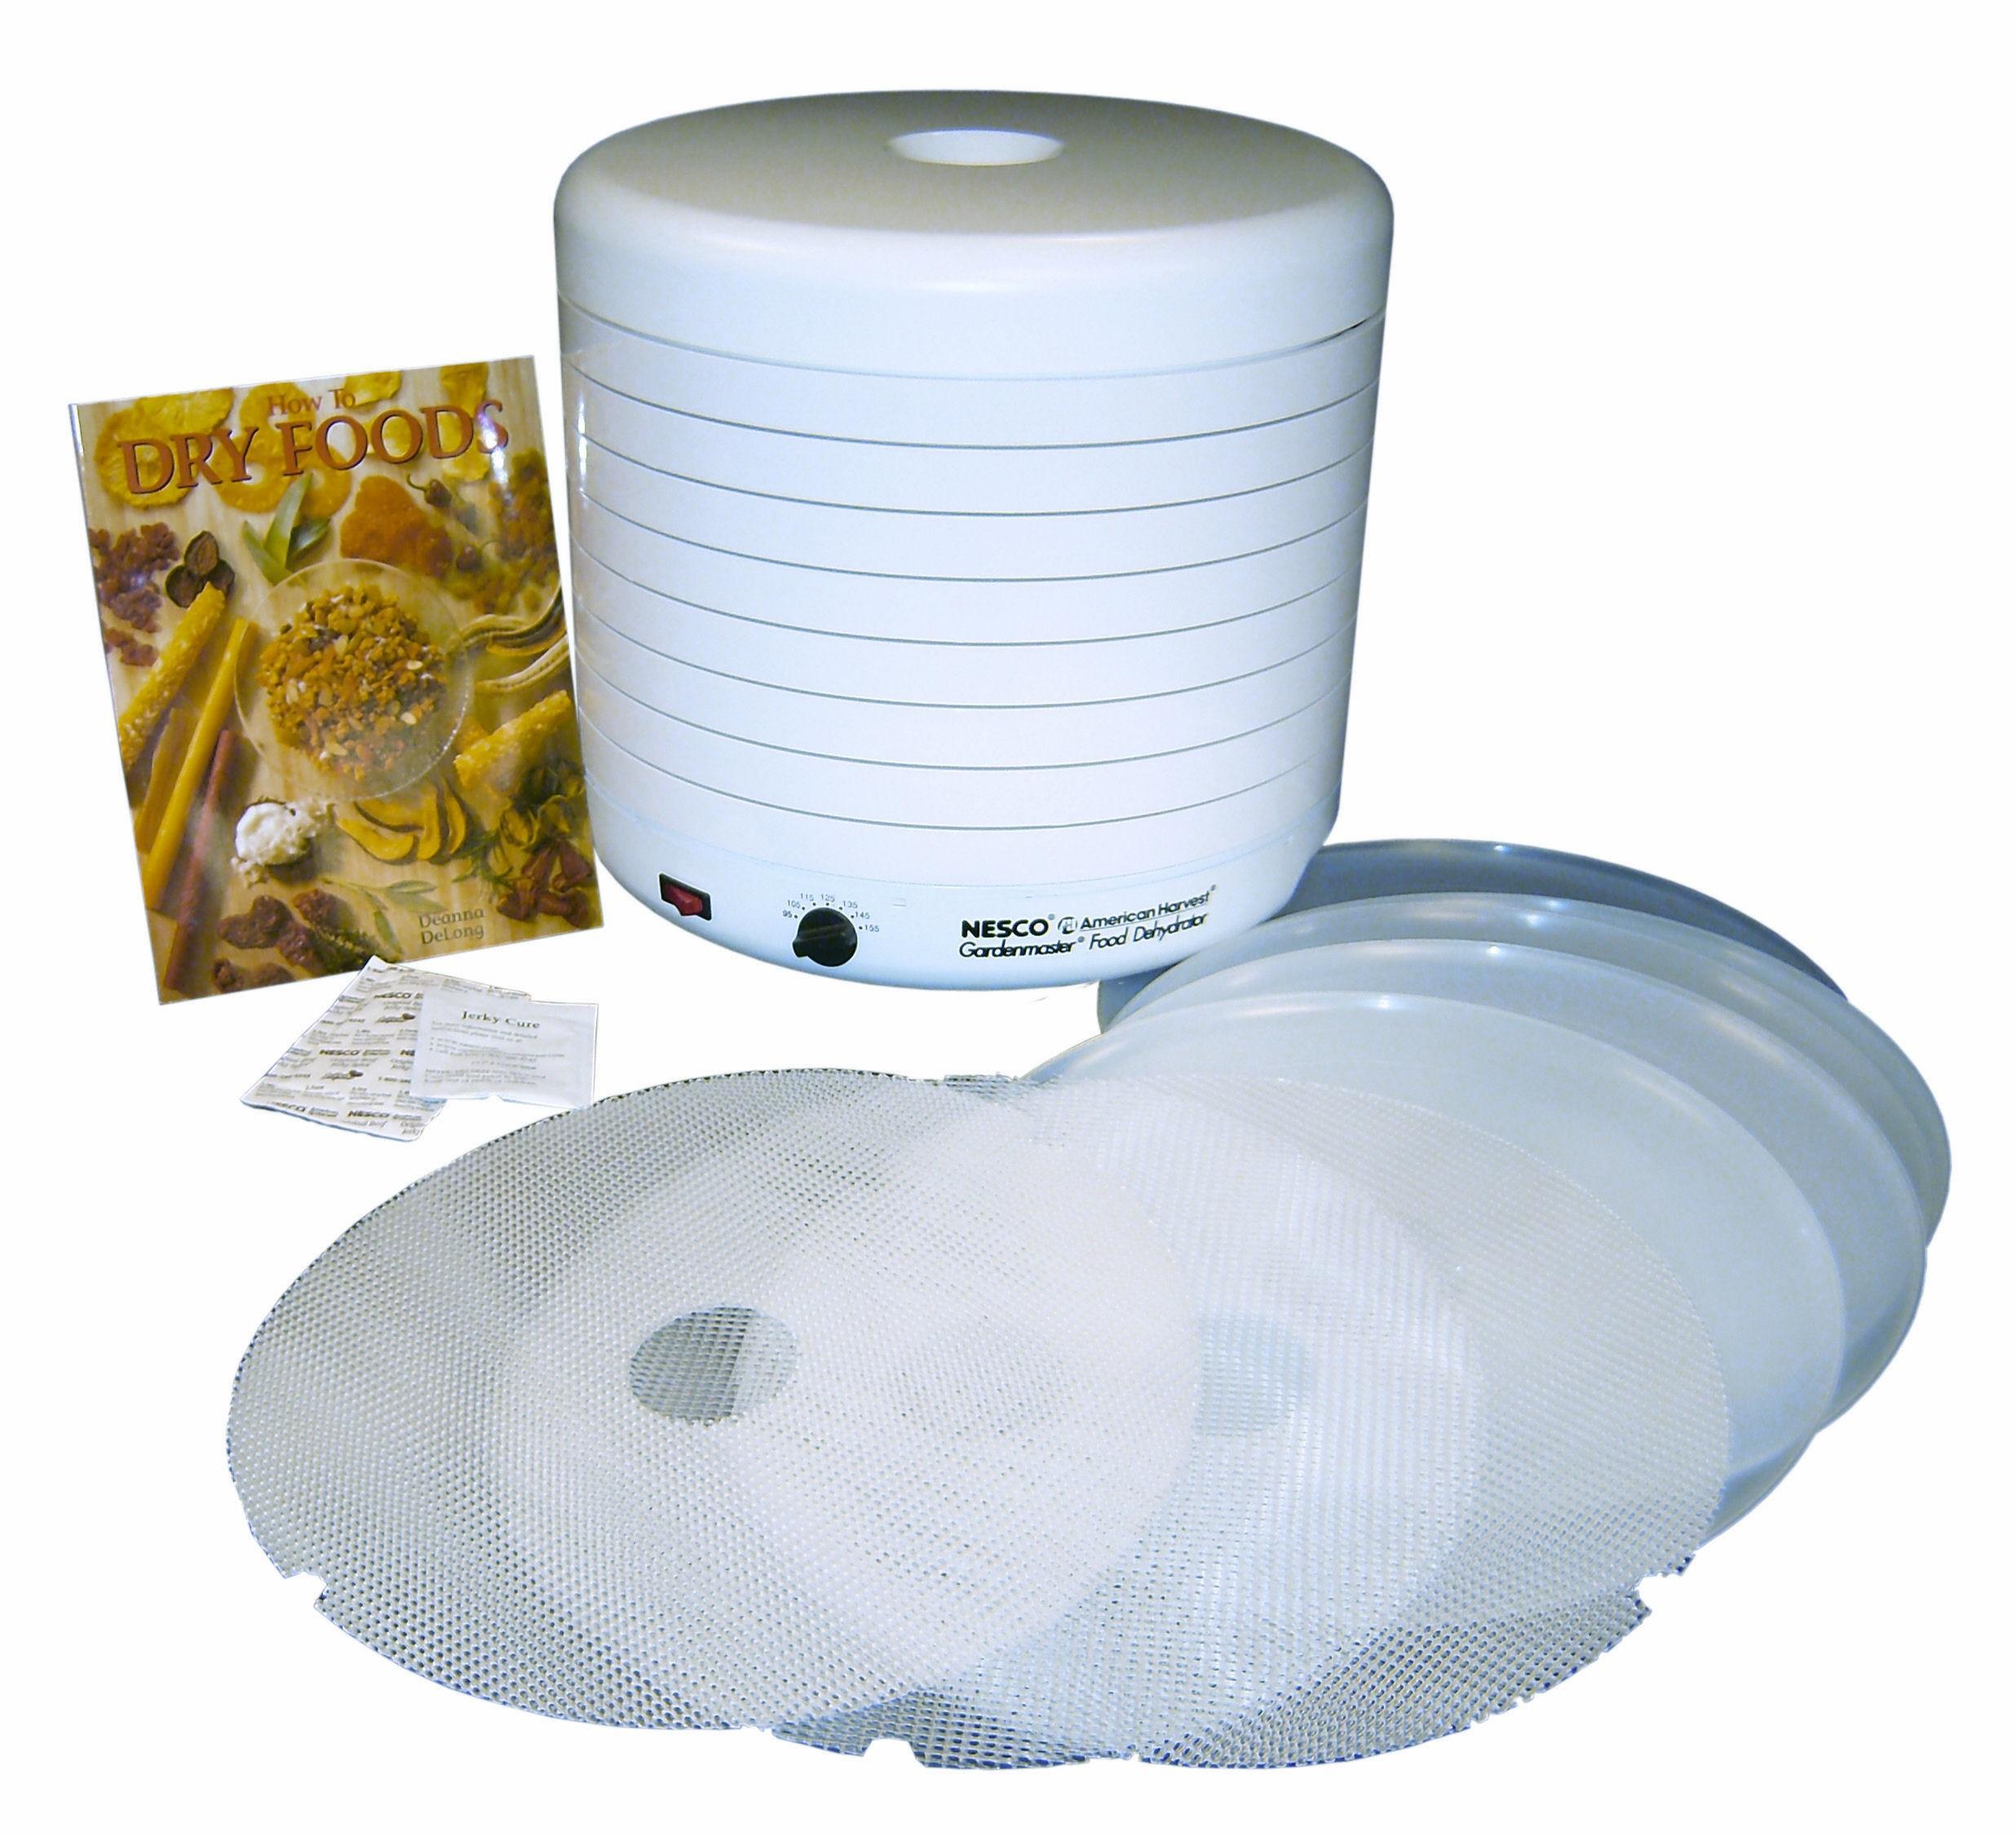 Amazoncom Nesco FD 1018A Gardenmaster Food Dehydrator watt